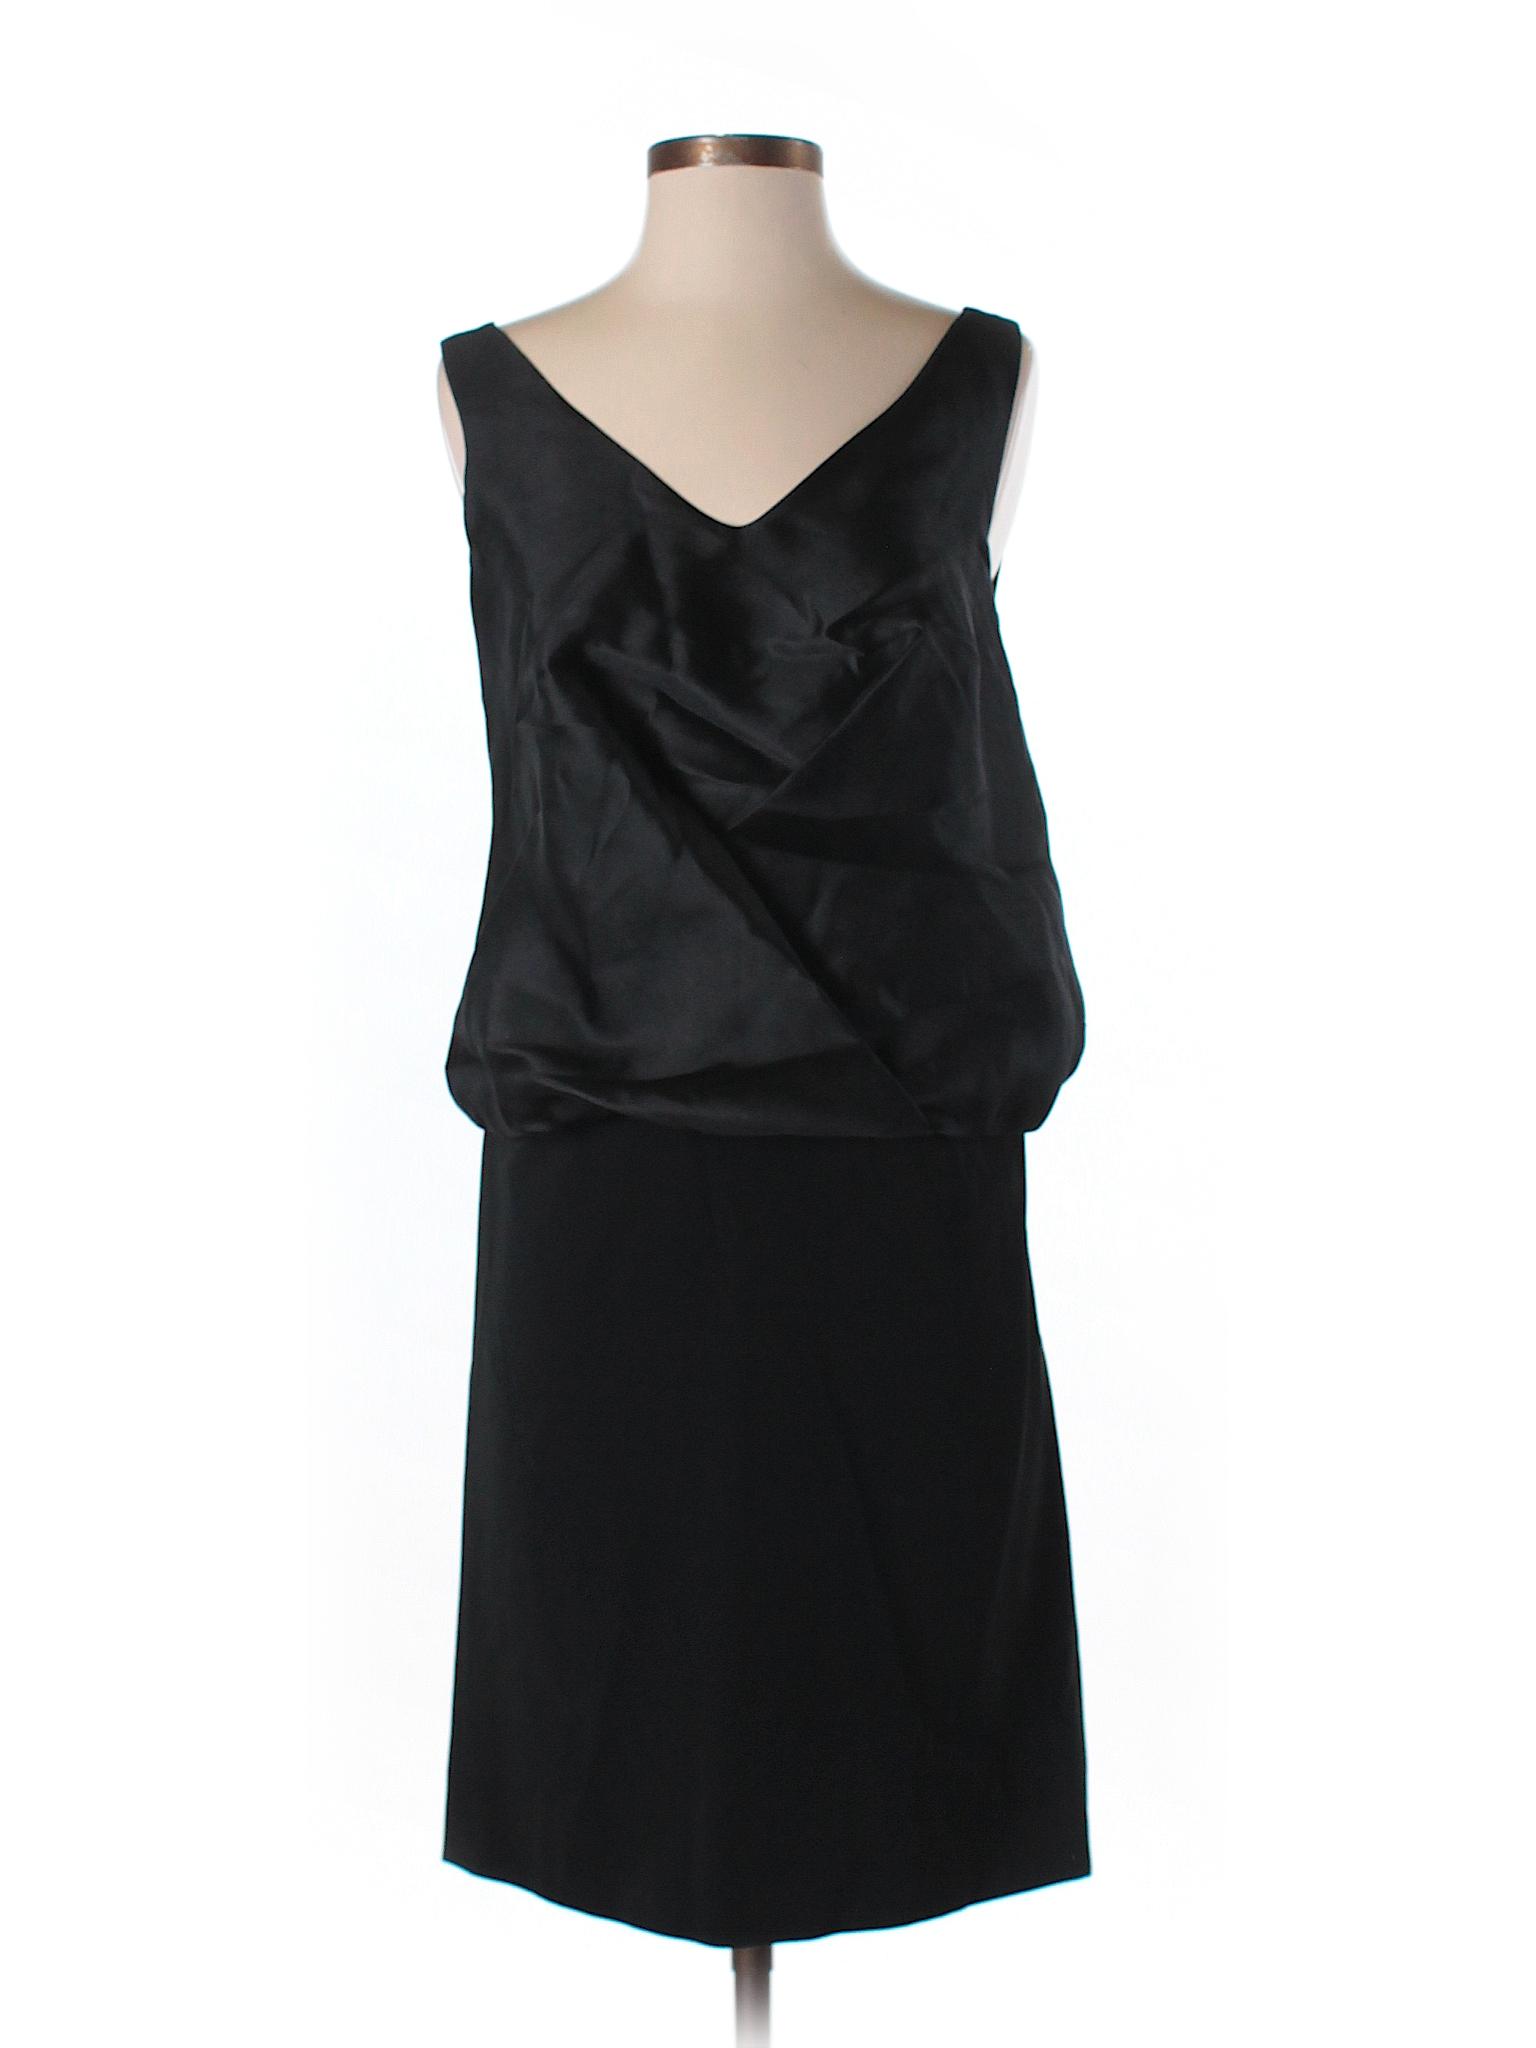 Casual Moschino And Selling Cheap Chic Dress SWwnznIq6